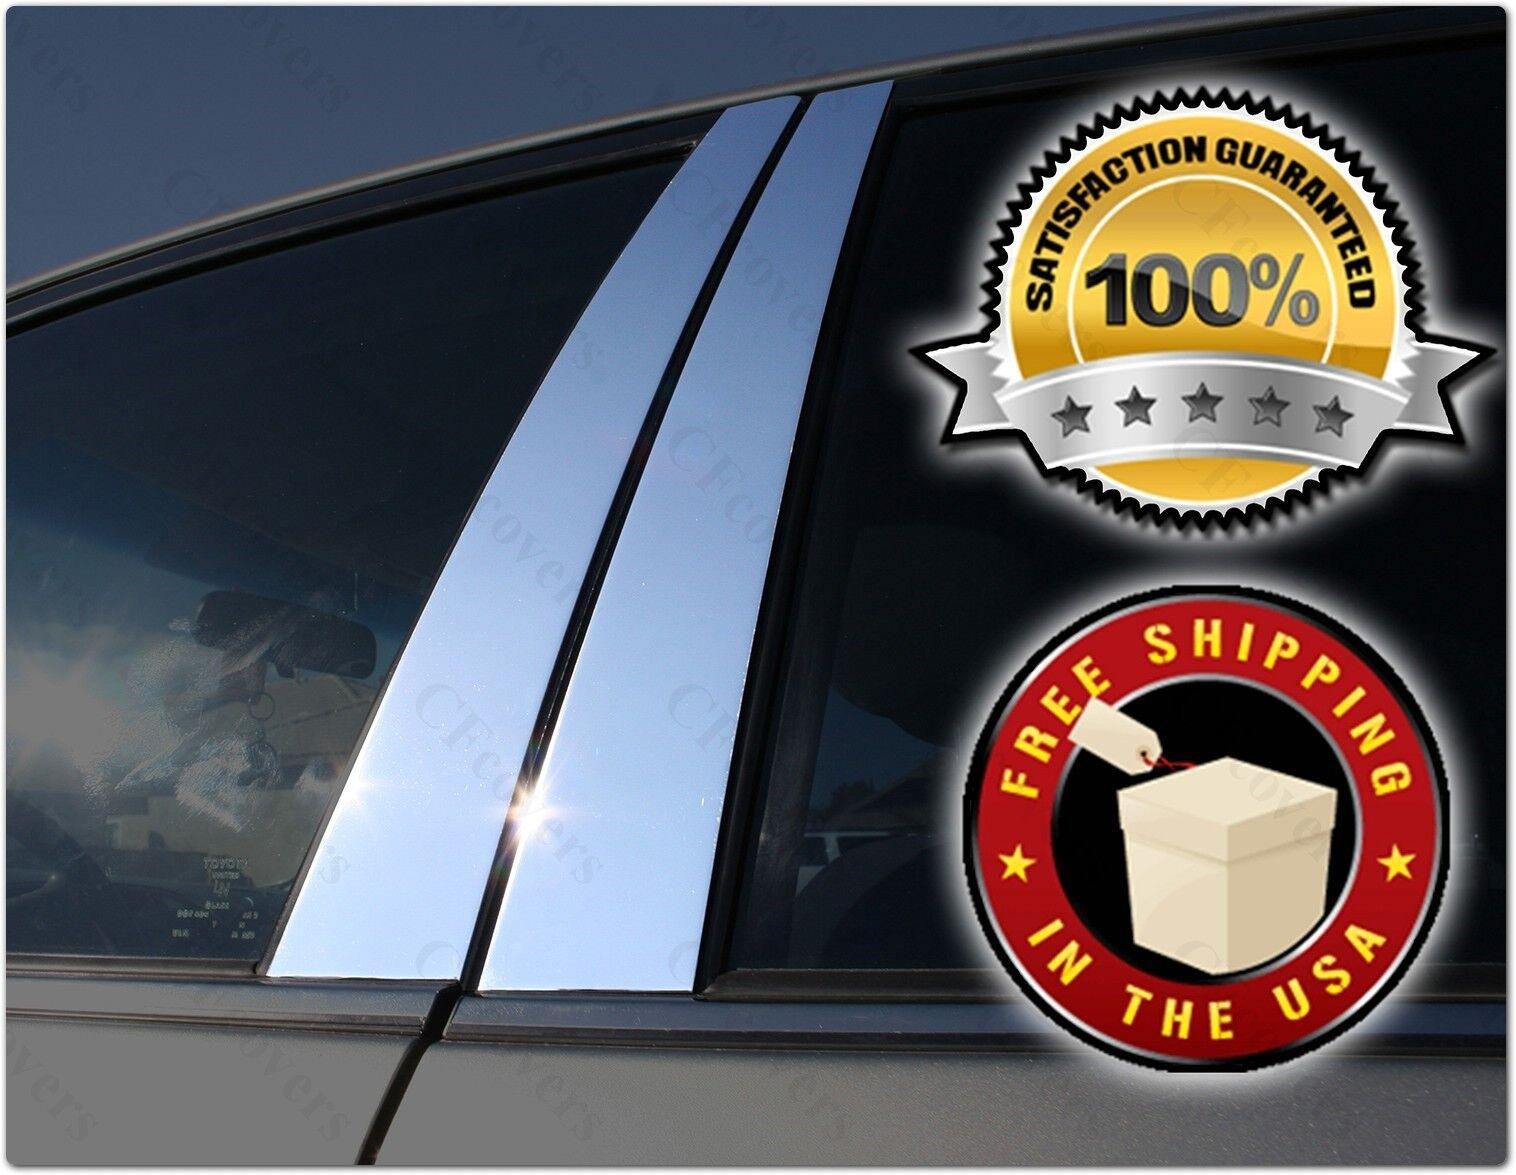 BLACK Pillar Posts for Cadillac ATS 13-15 6pc Set Cover Door Trim Window Piano